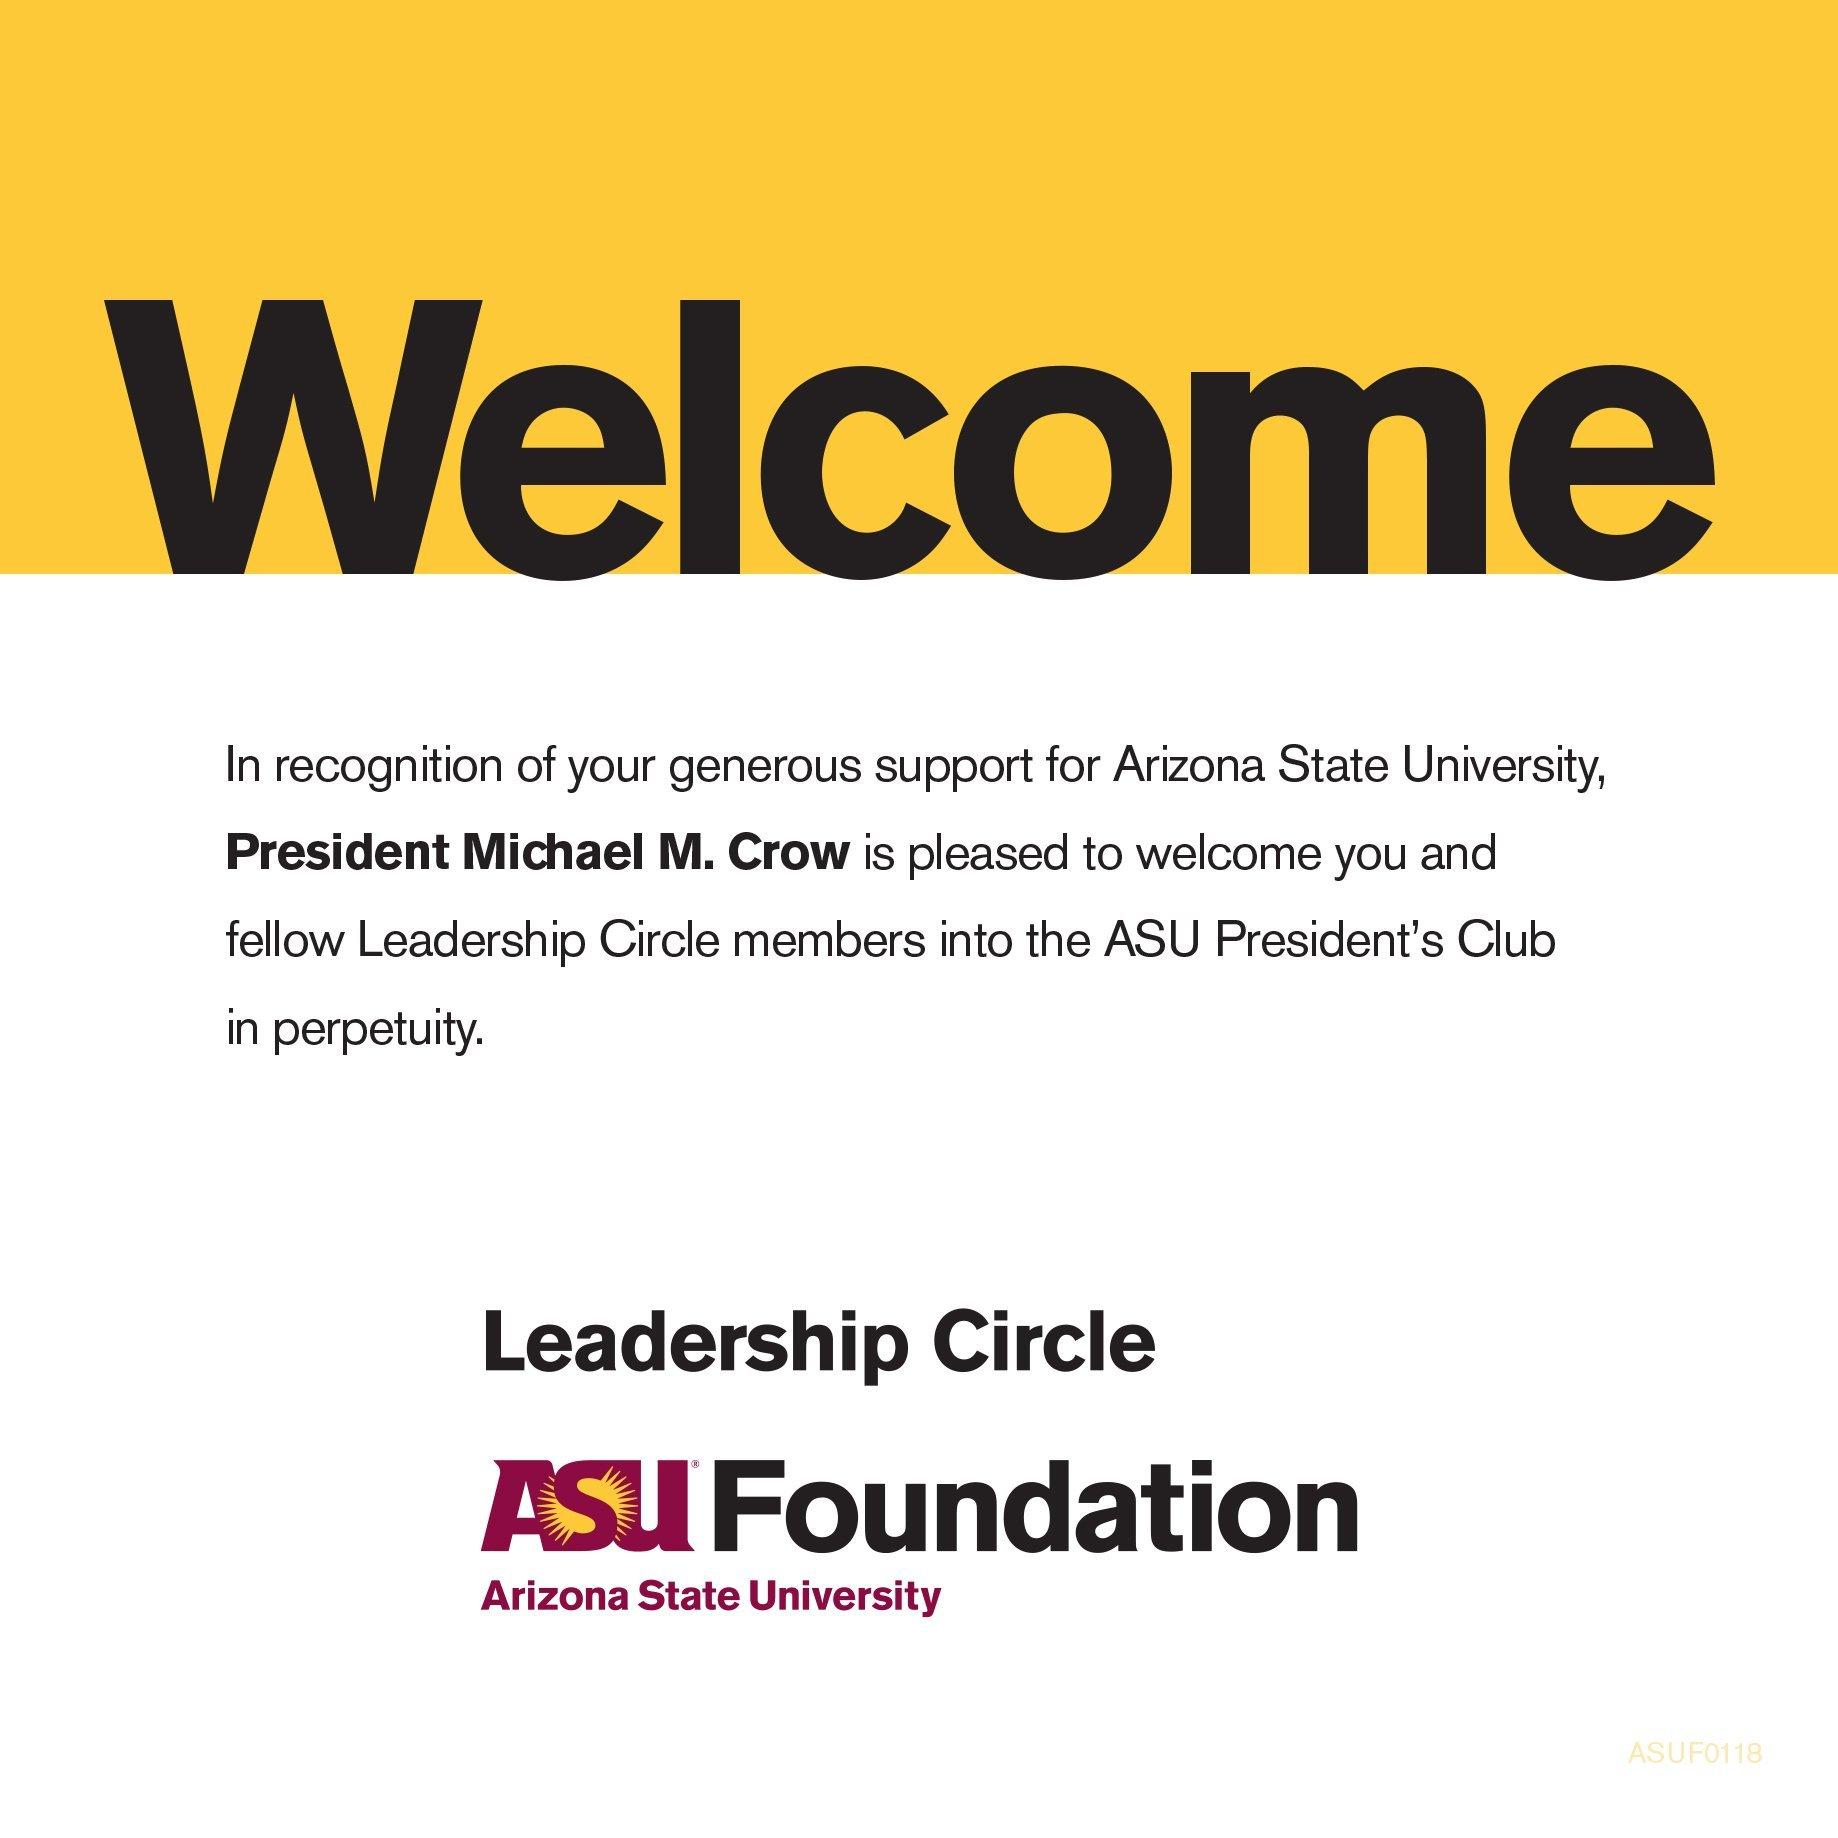 ASU-Presidents-Club-New-Member-Insert-Leadership-Circle1